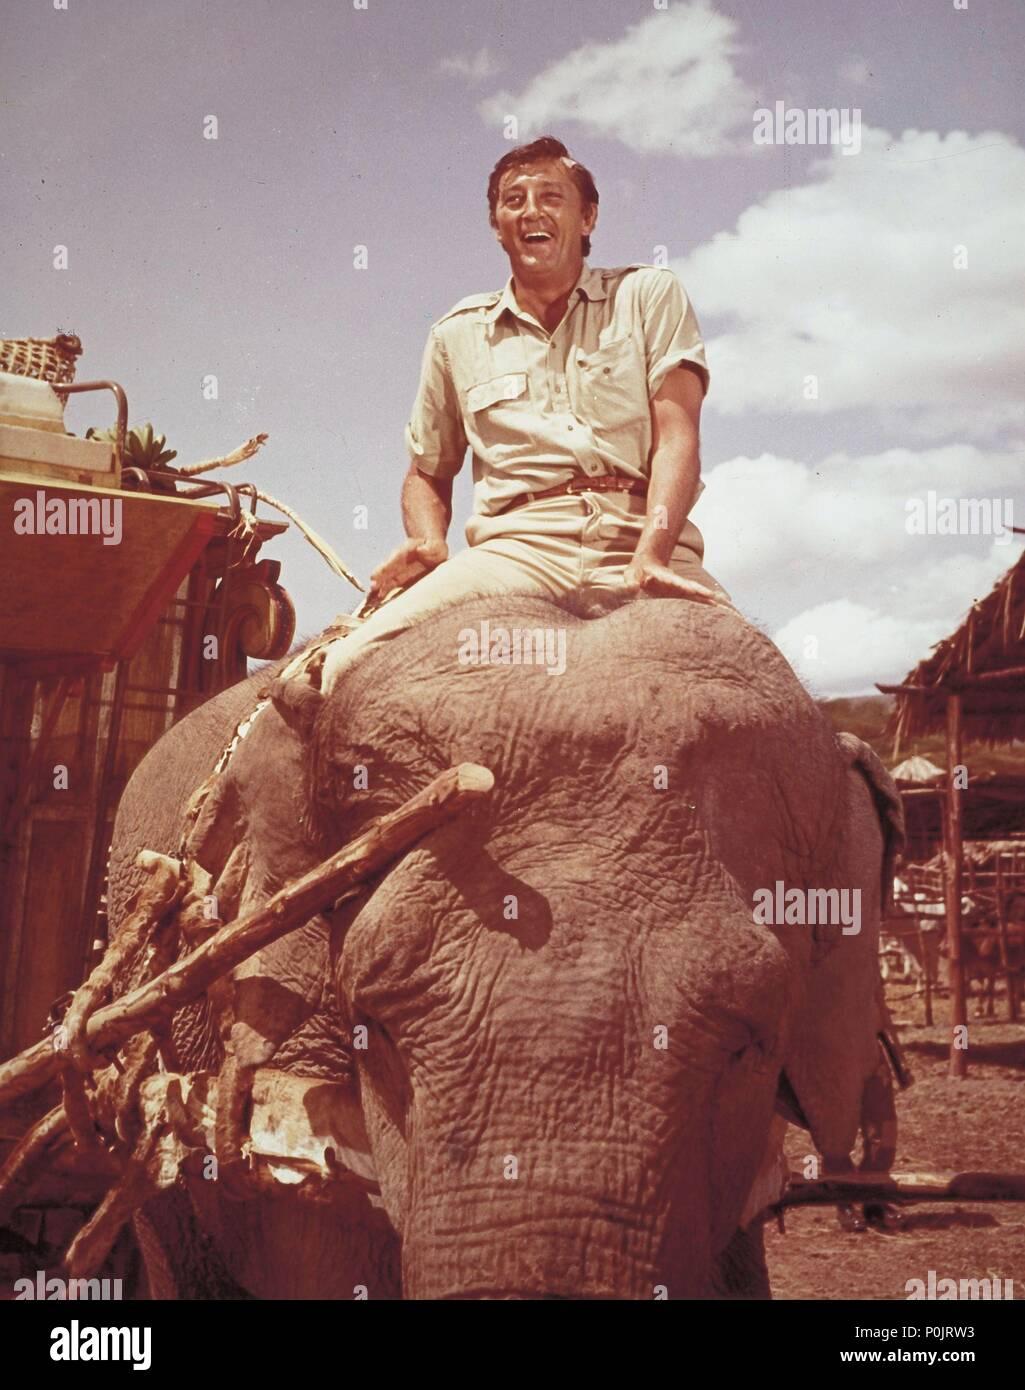 El título de la película original: Mister Moisés. Título en inglés: Mister Moisés. El director de cine: Ronald NEAME. Año: 1965. Estrellas: Robert Mitchum. Crédito: United Artists / Álbum Foto de stock